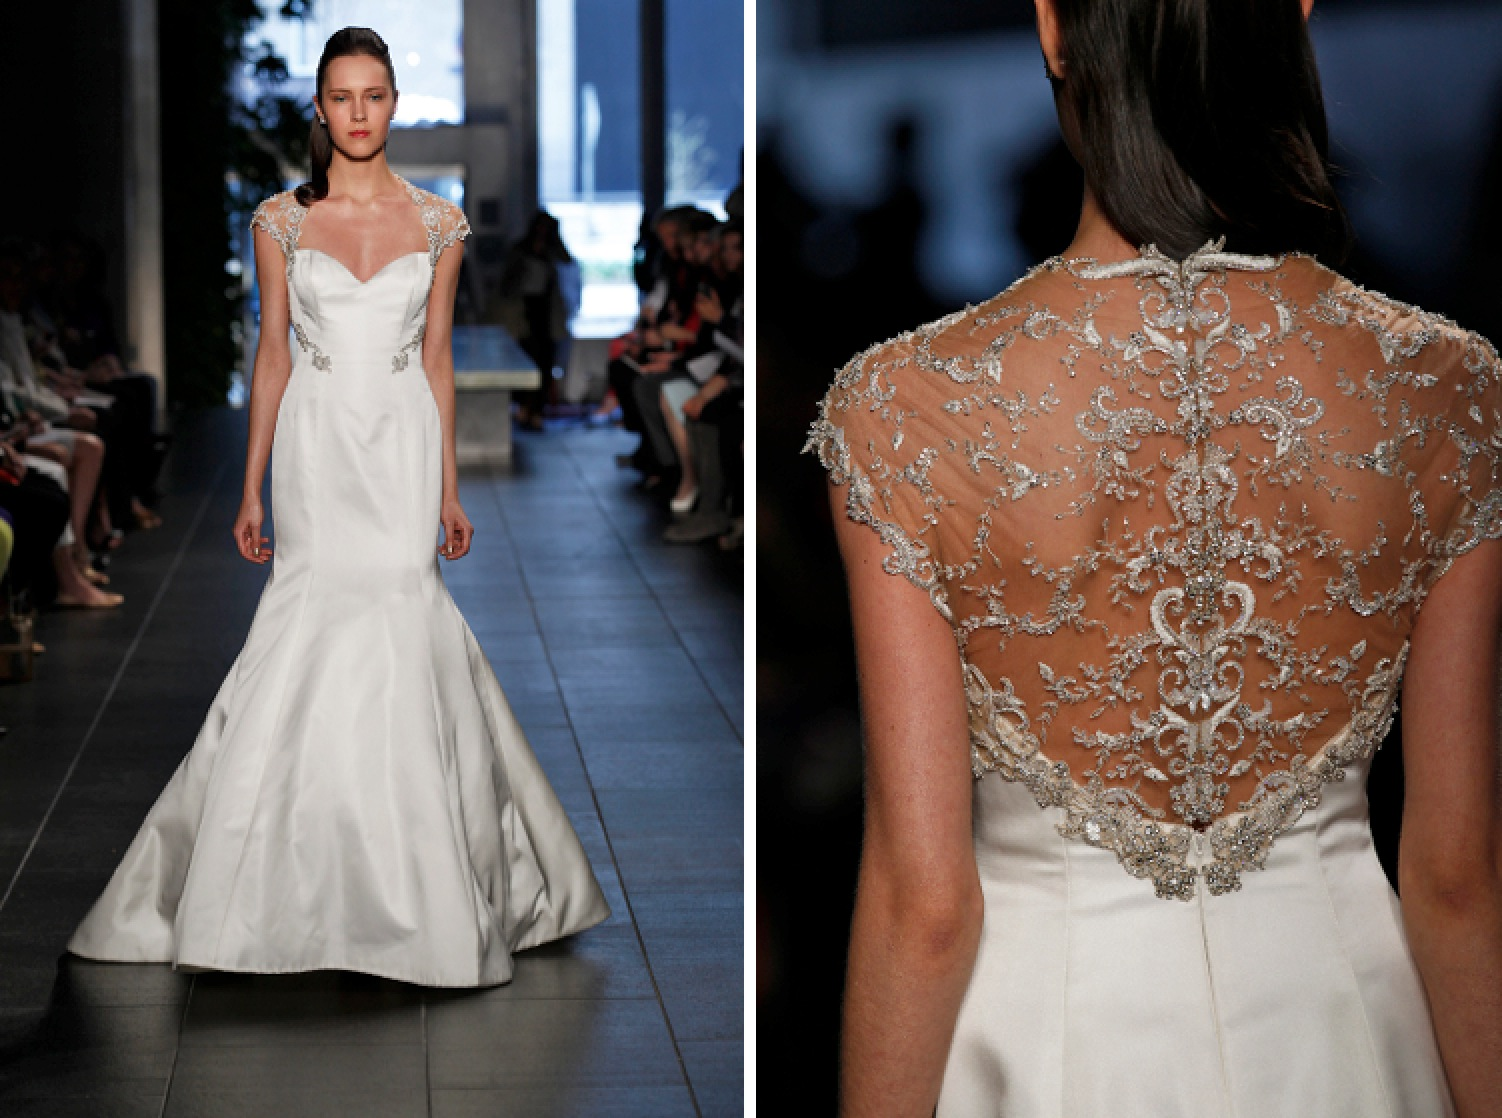 Wedding Dresses, Mermaid Wedding Dresses, Hollywood Glam Wedding Dresses, Fashion, Glam Weddings, Rivini